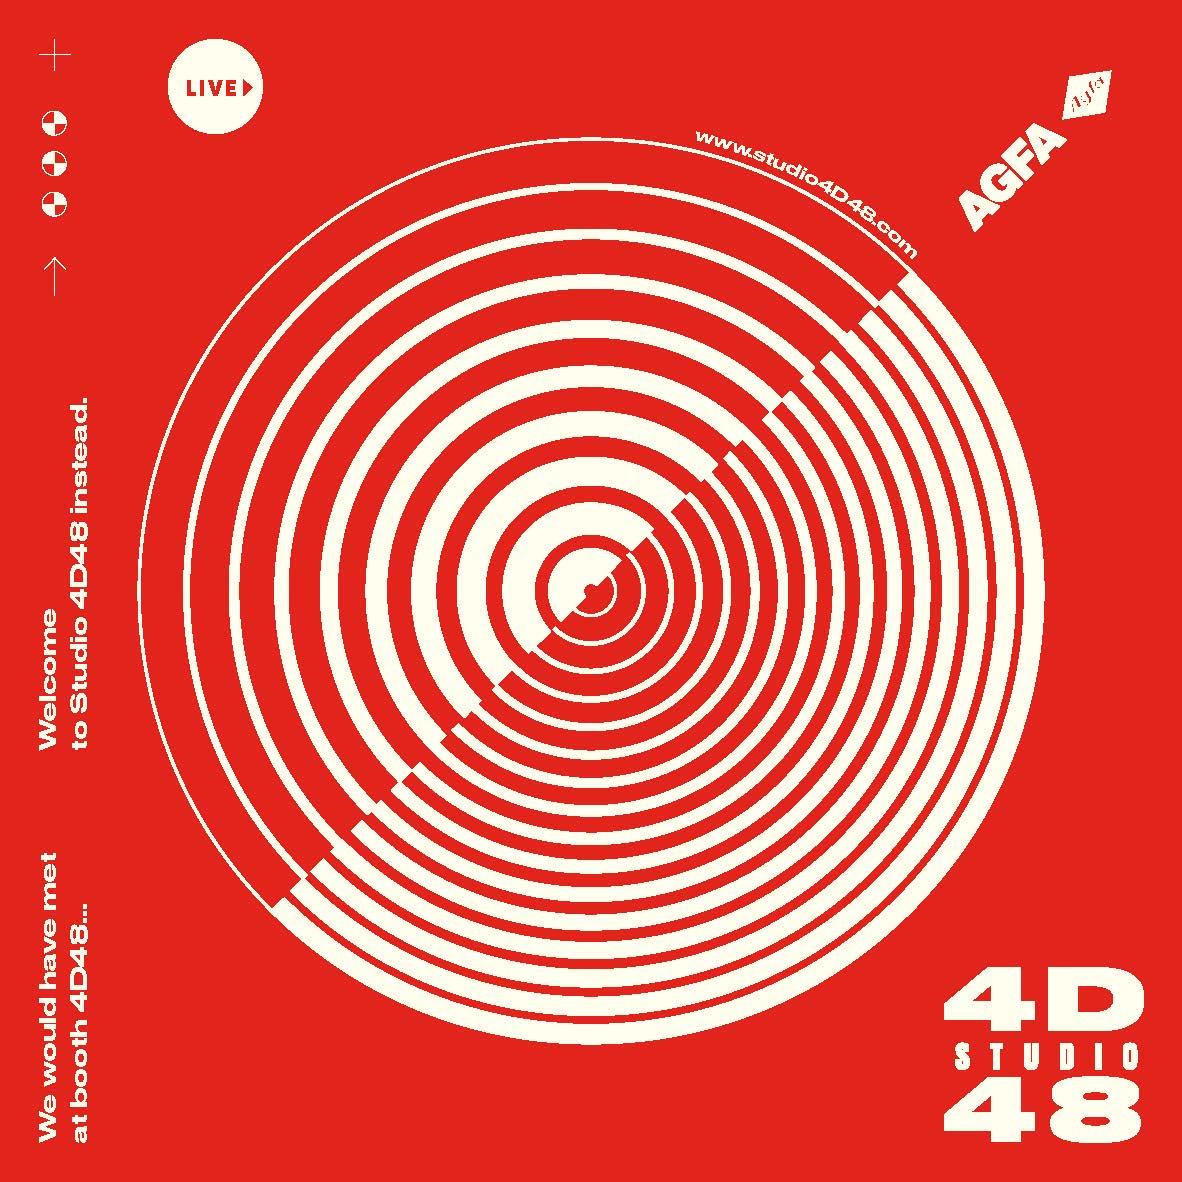 Studio 4D48 invitation front